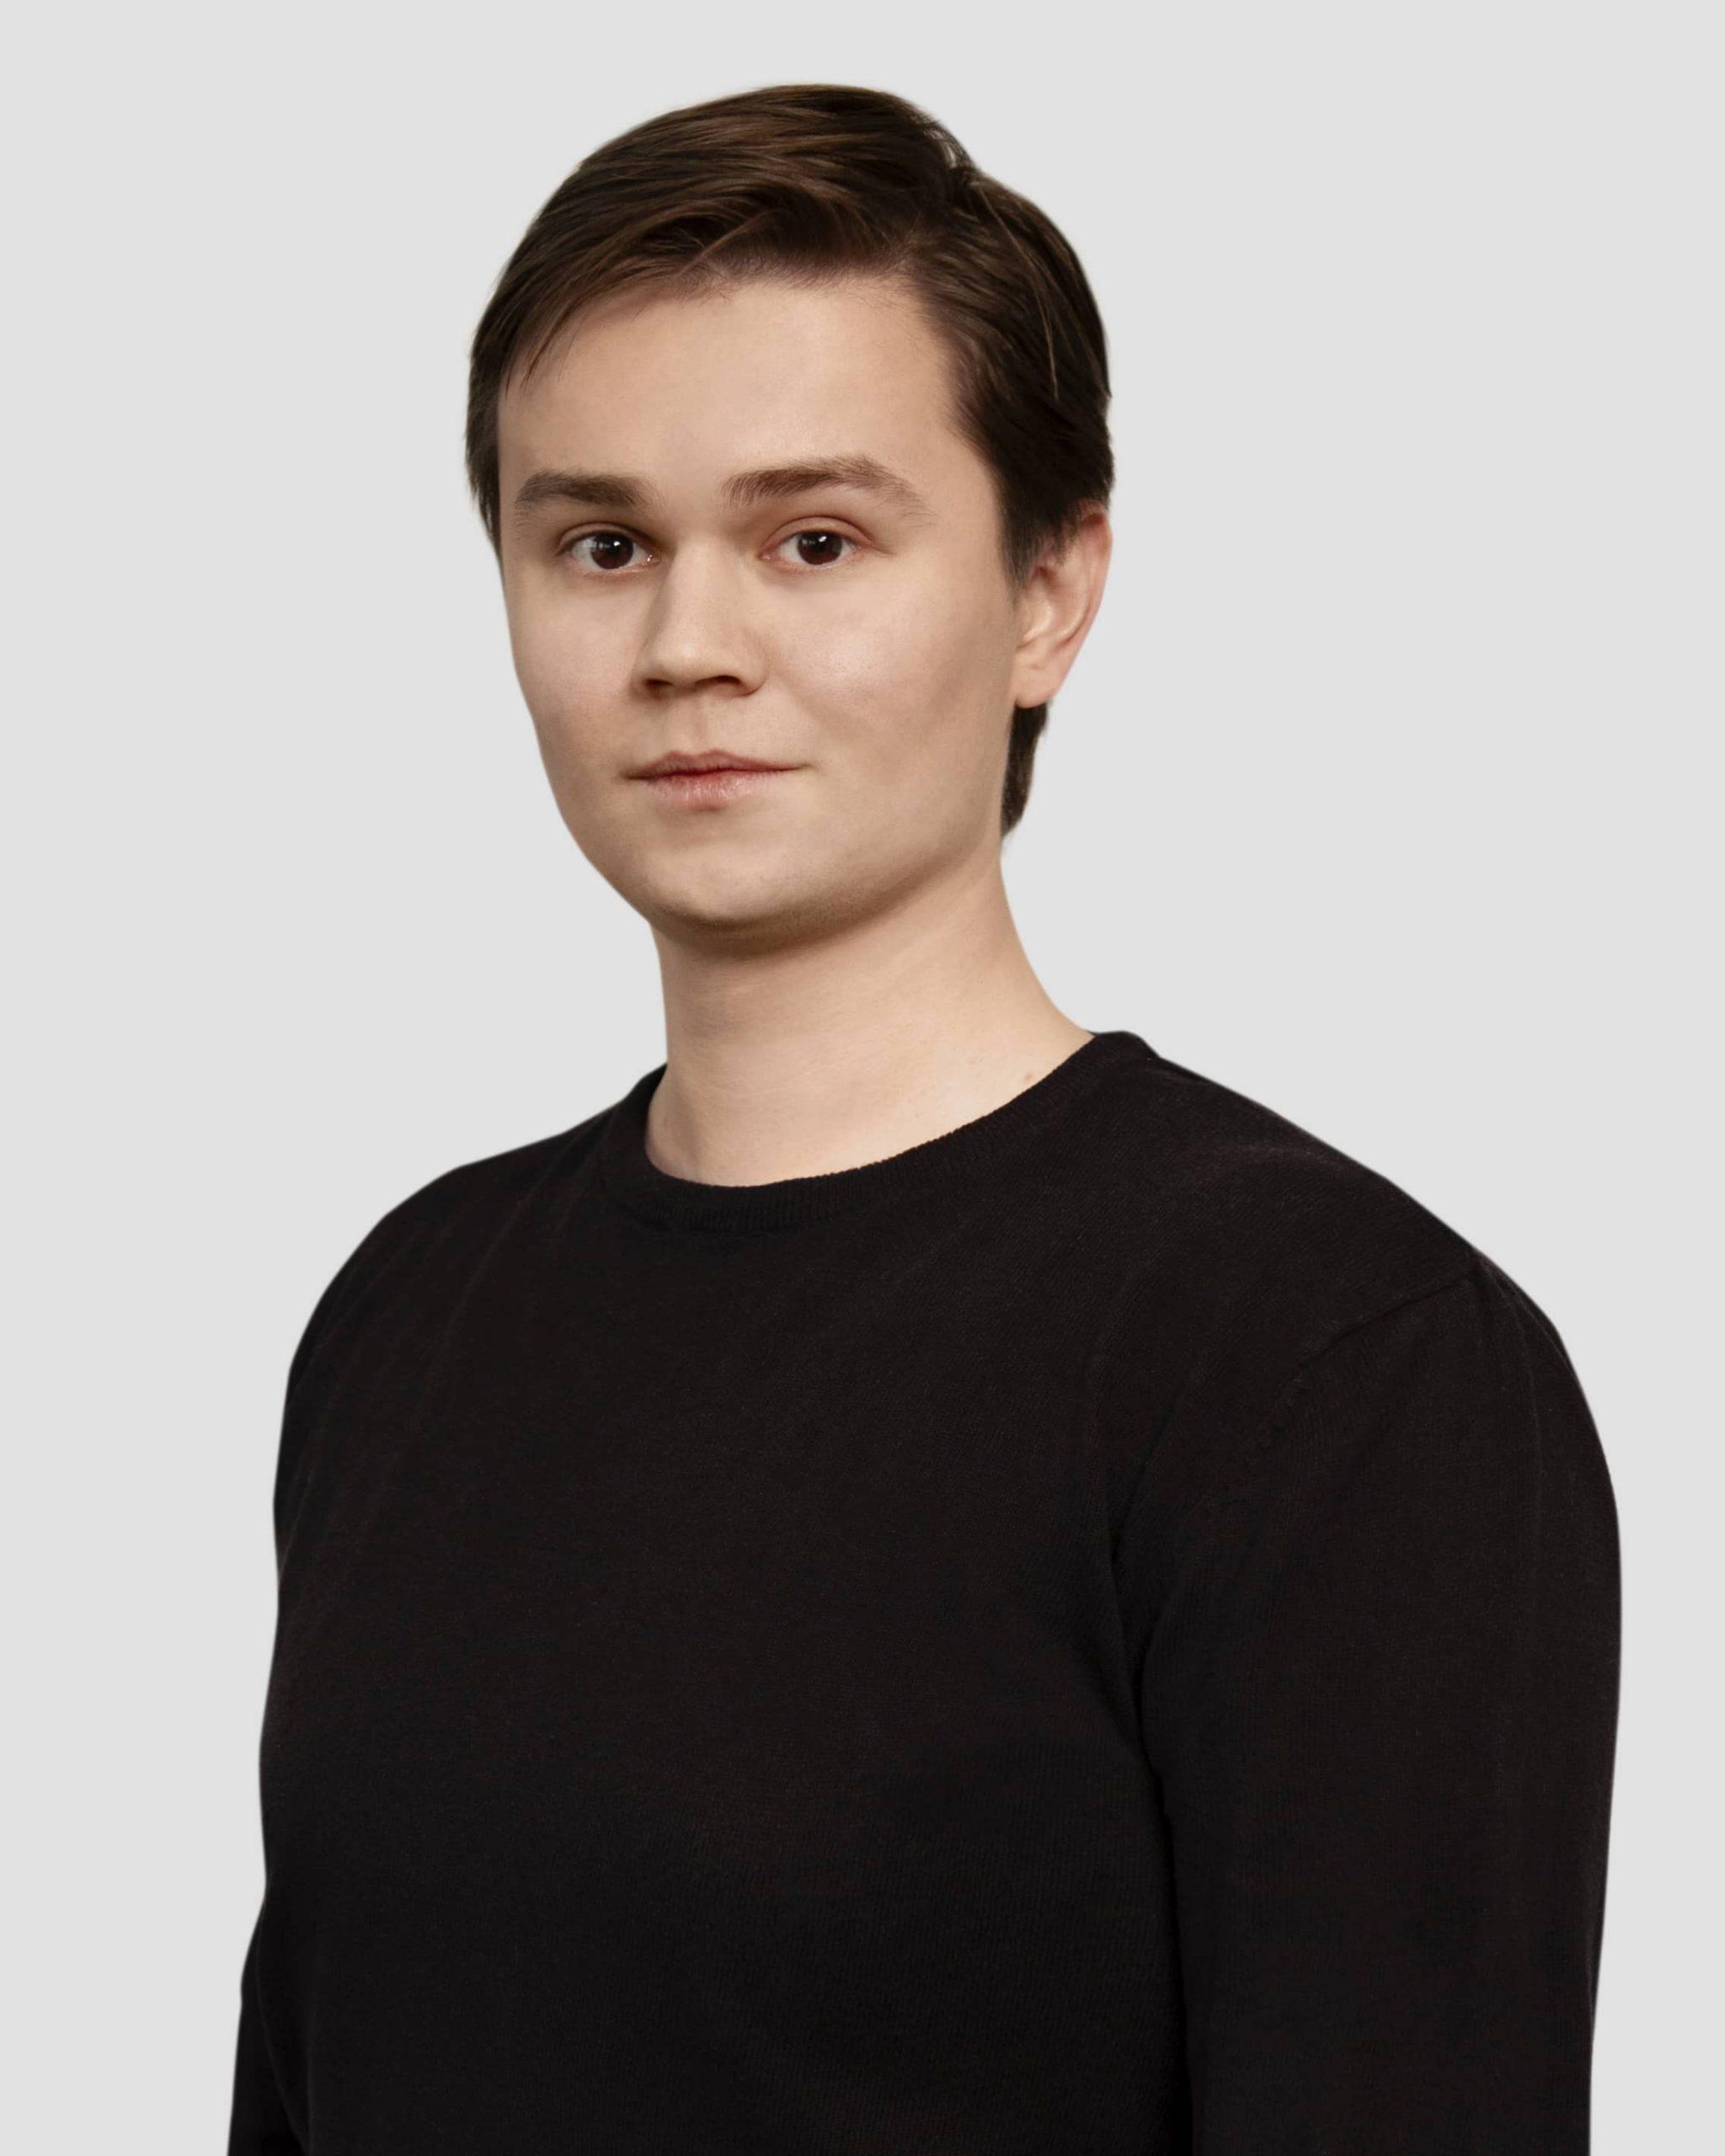 Michał Krajka